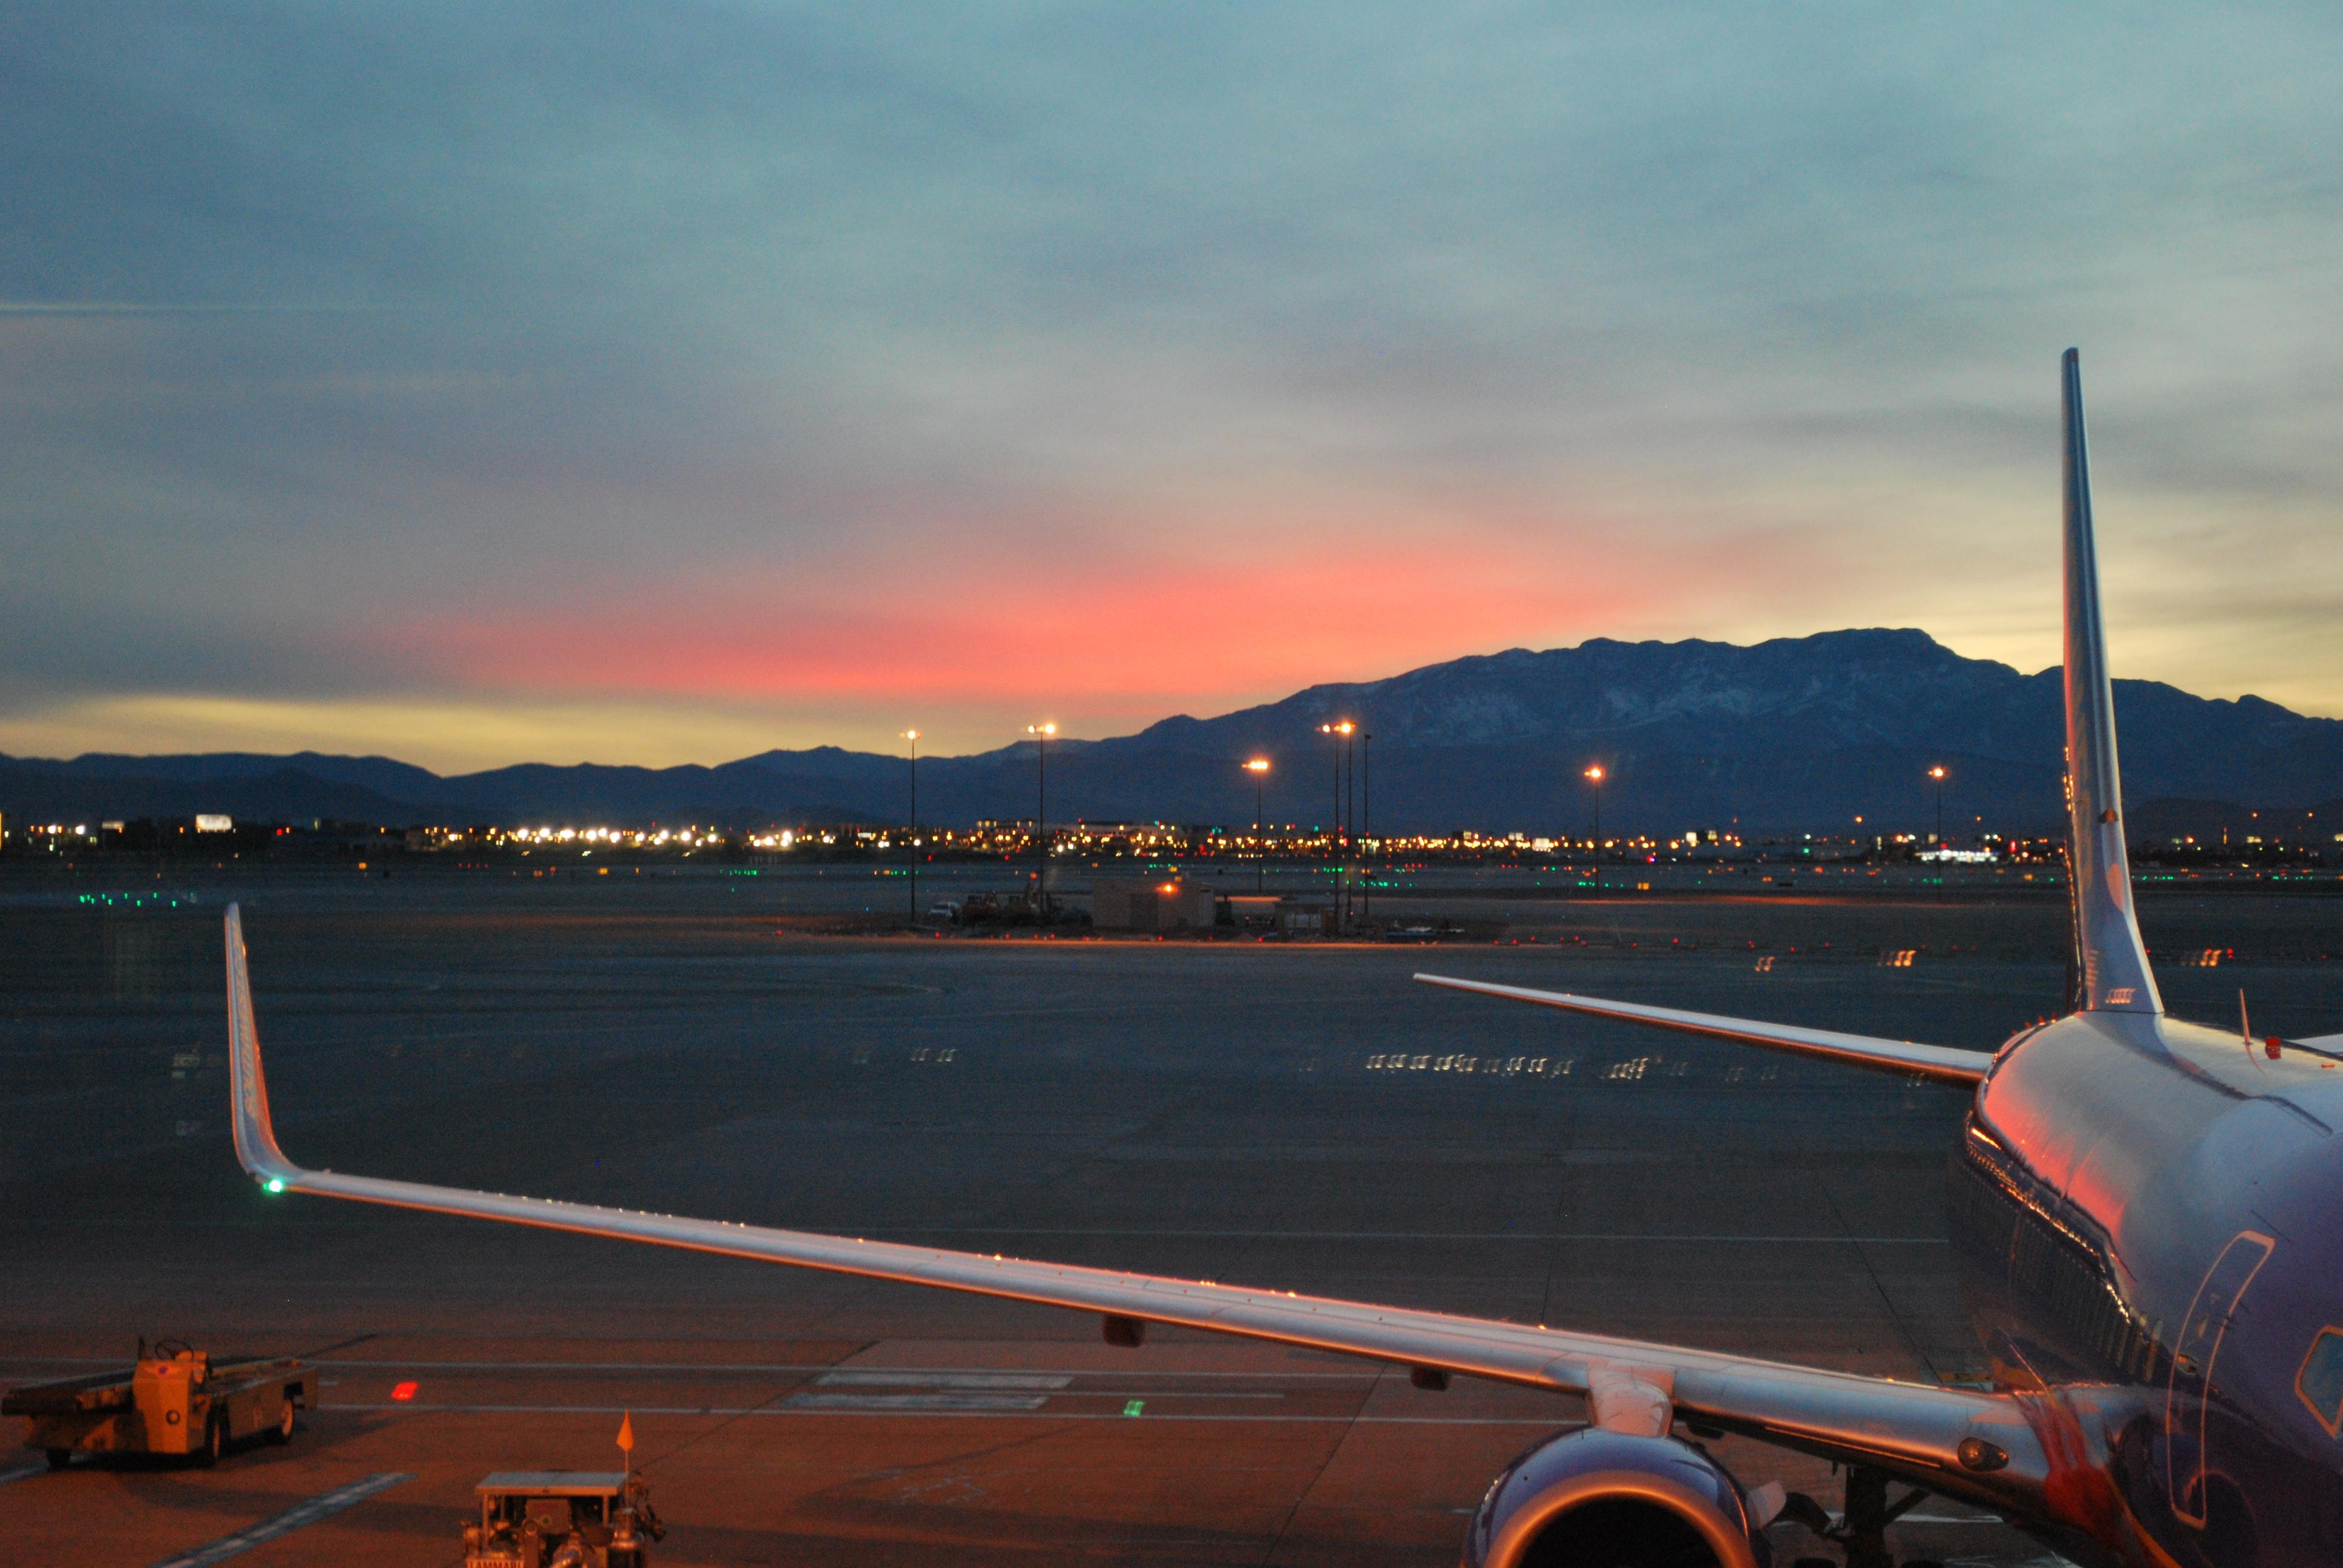 Pista do aeroporto de Araguari é parcialmente reaberta